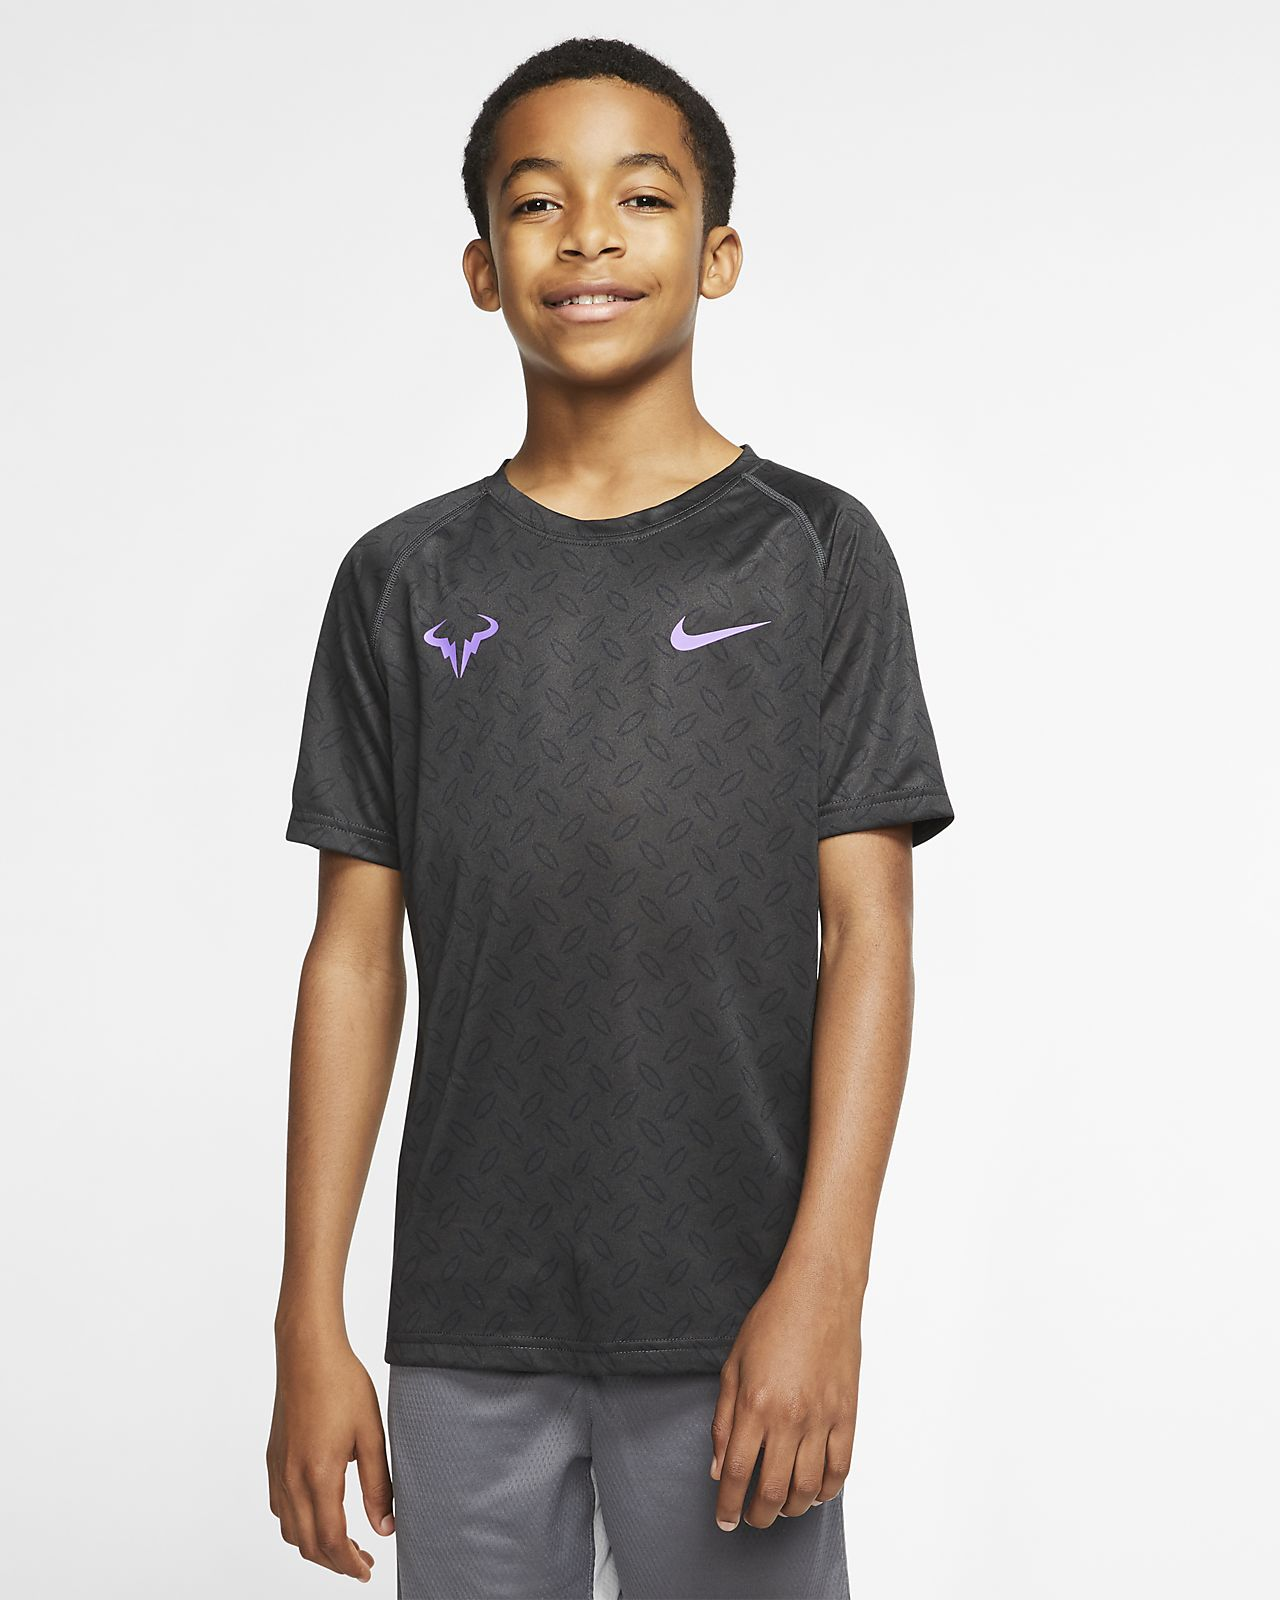 Chlapecké tenisové tričko NikeCourt Dri-FIT Rafa s grafickým motivem